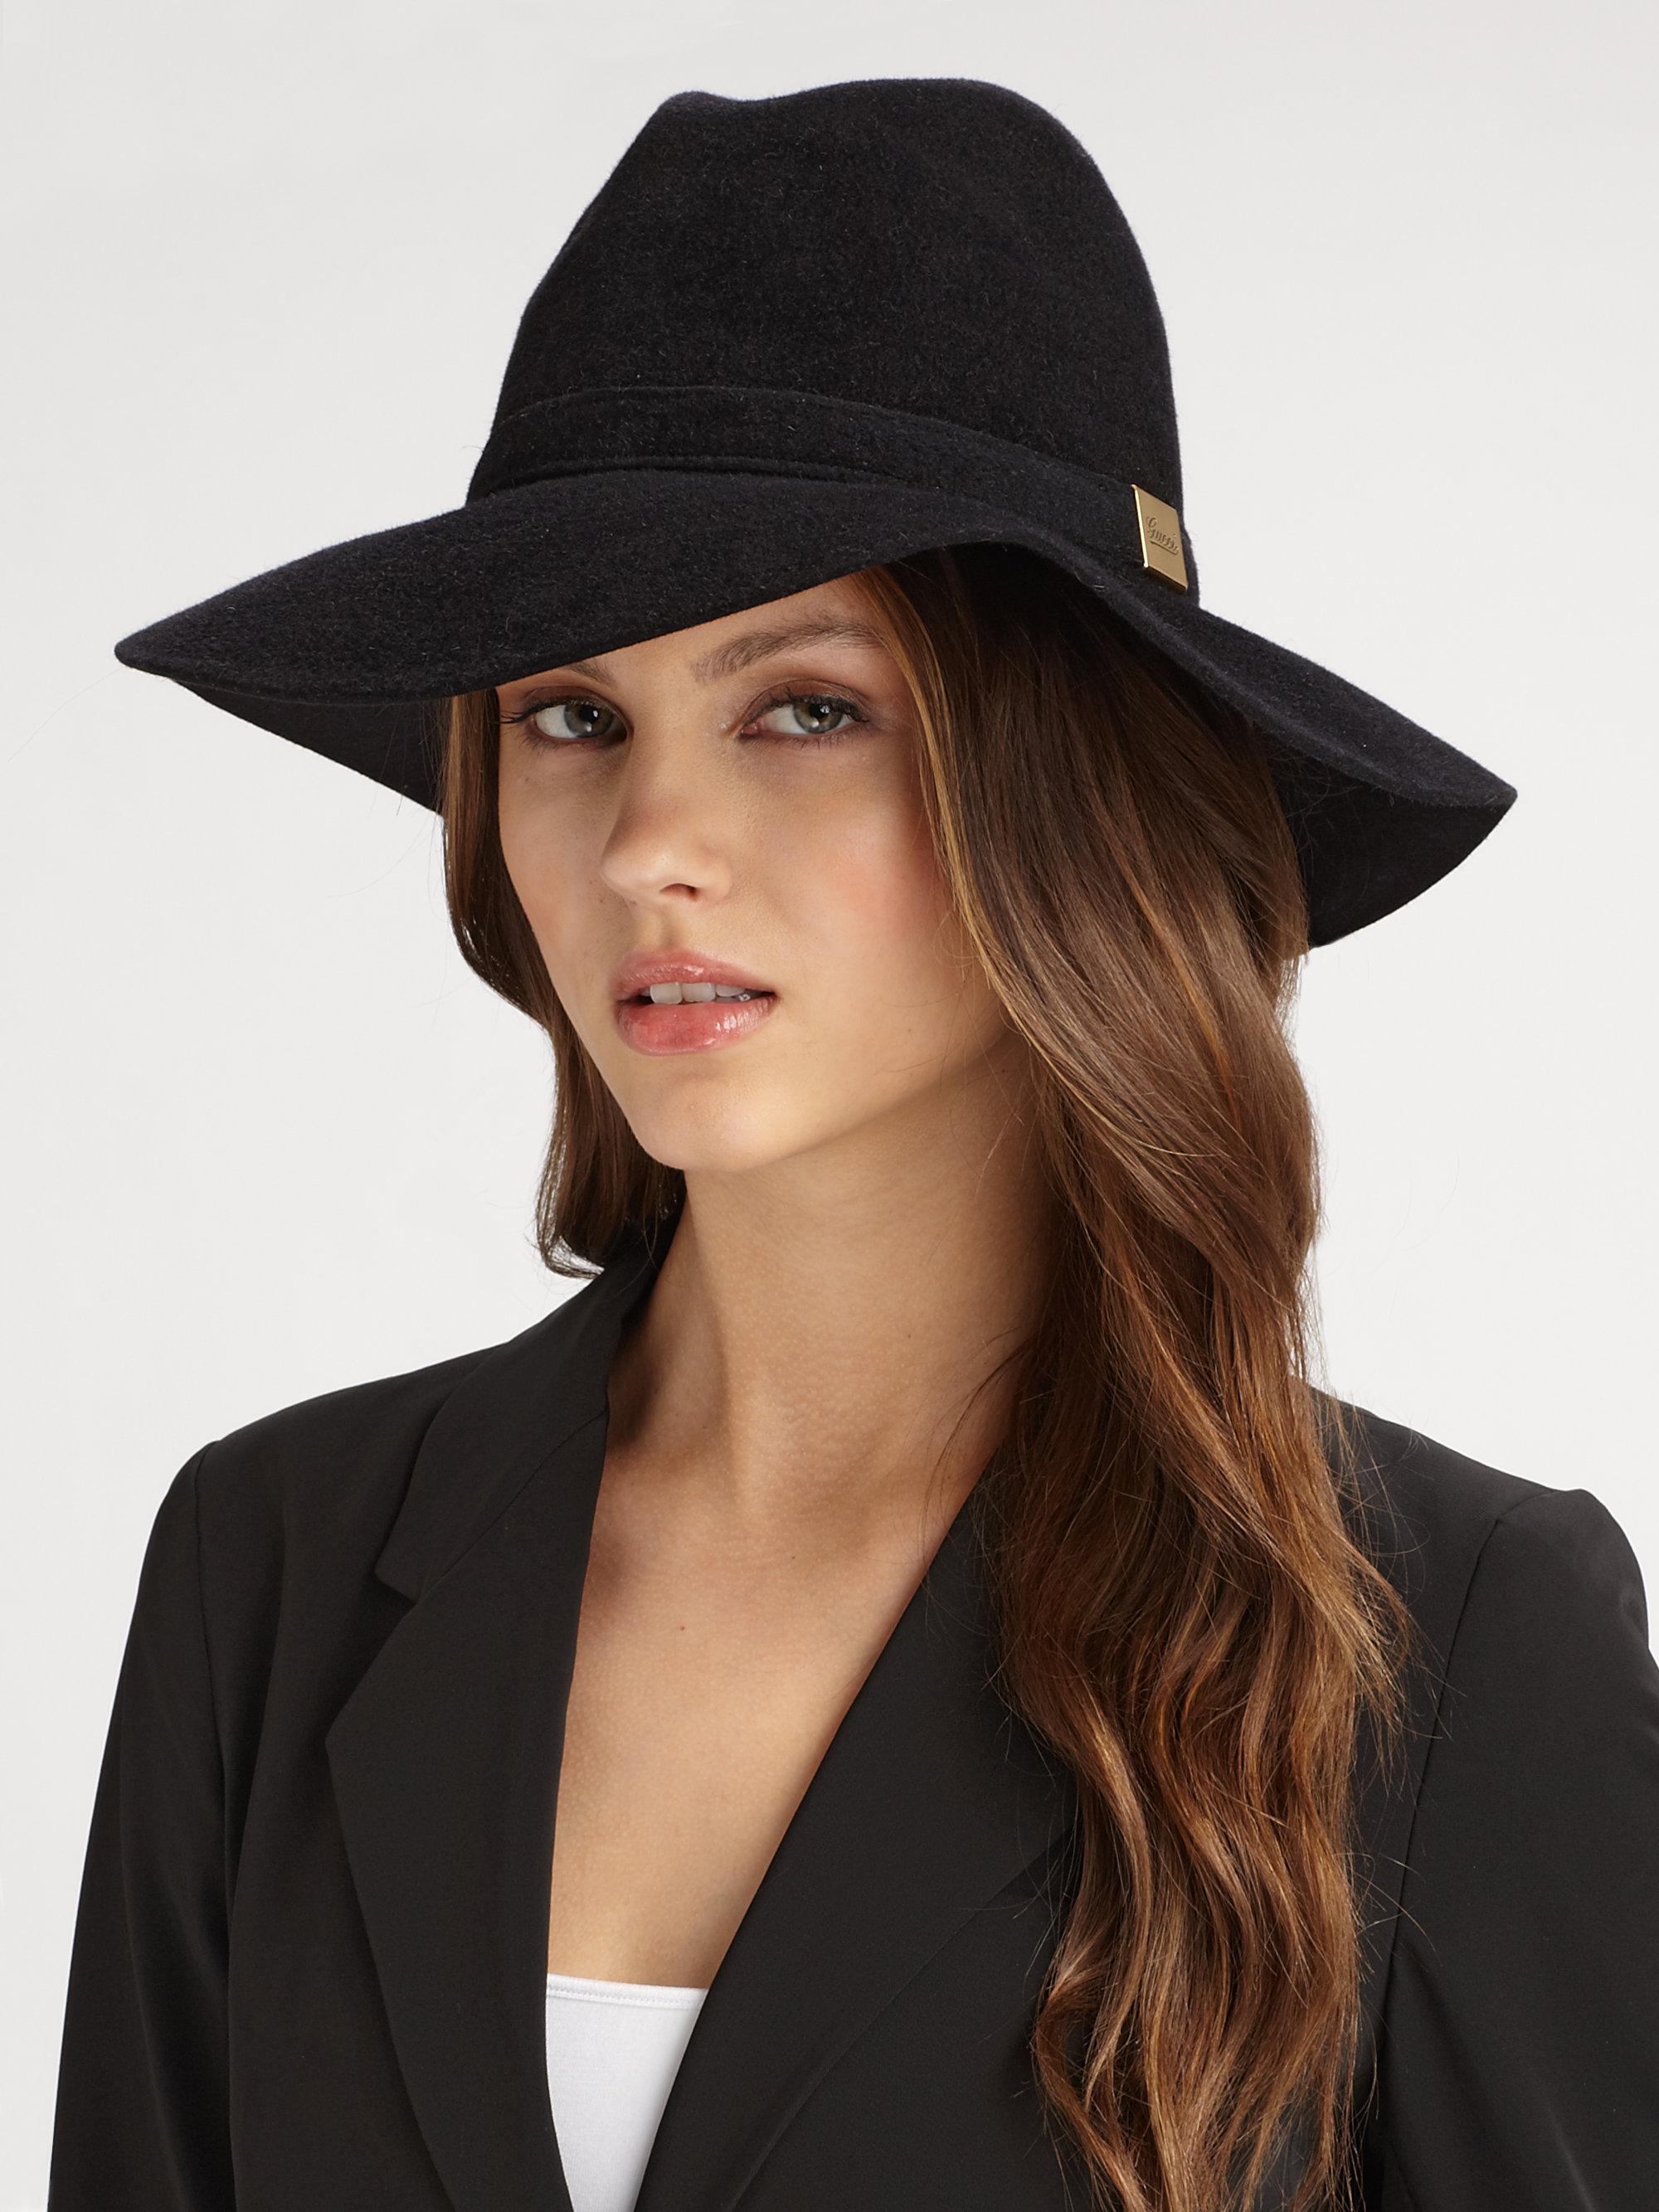 aac52d15f338b Lyst - Gucci Trilby Floppy Hat in Black